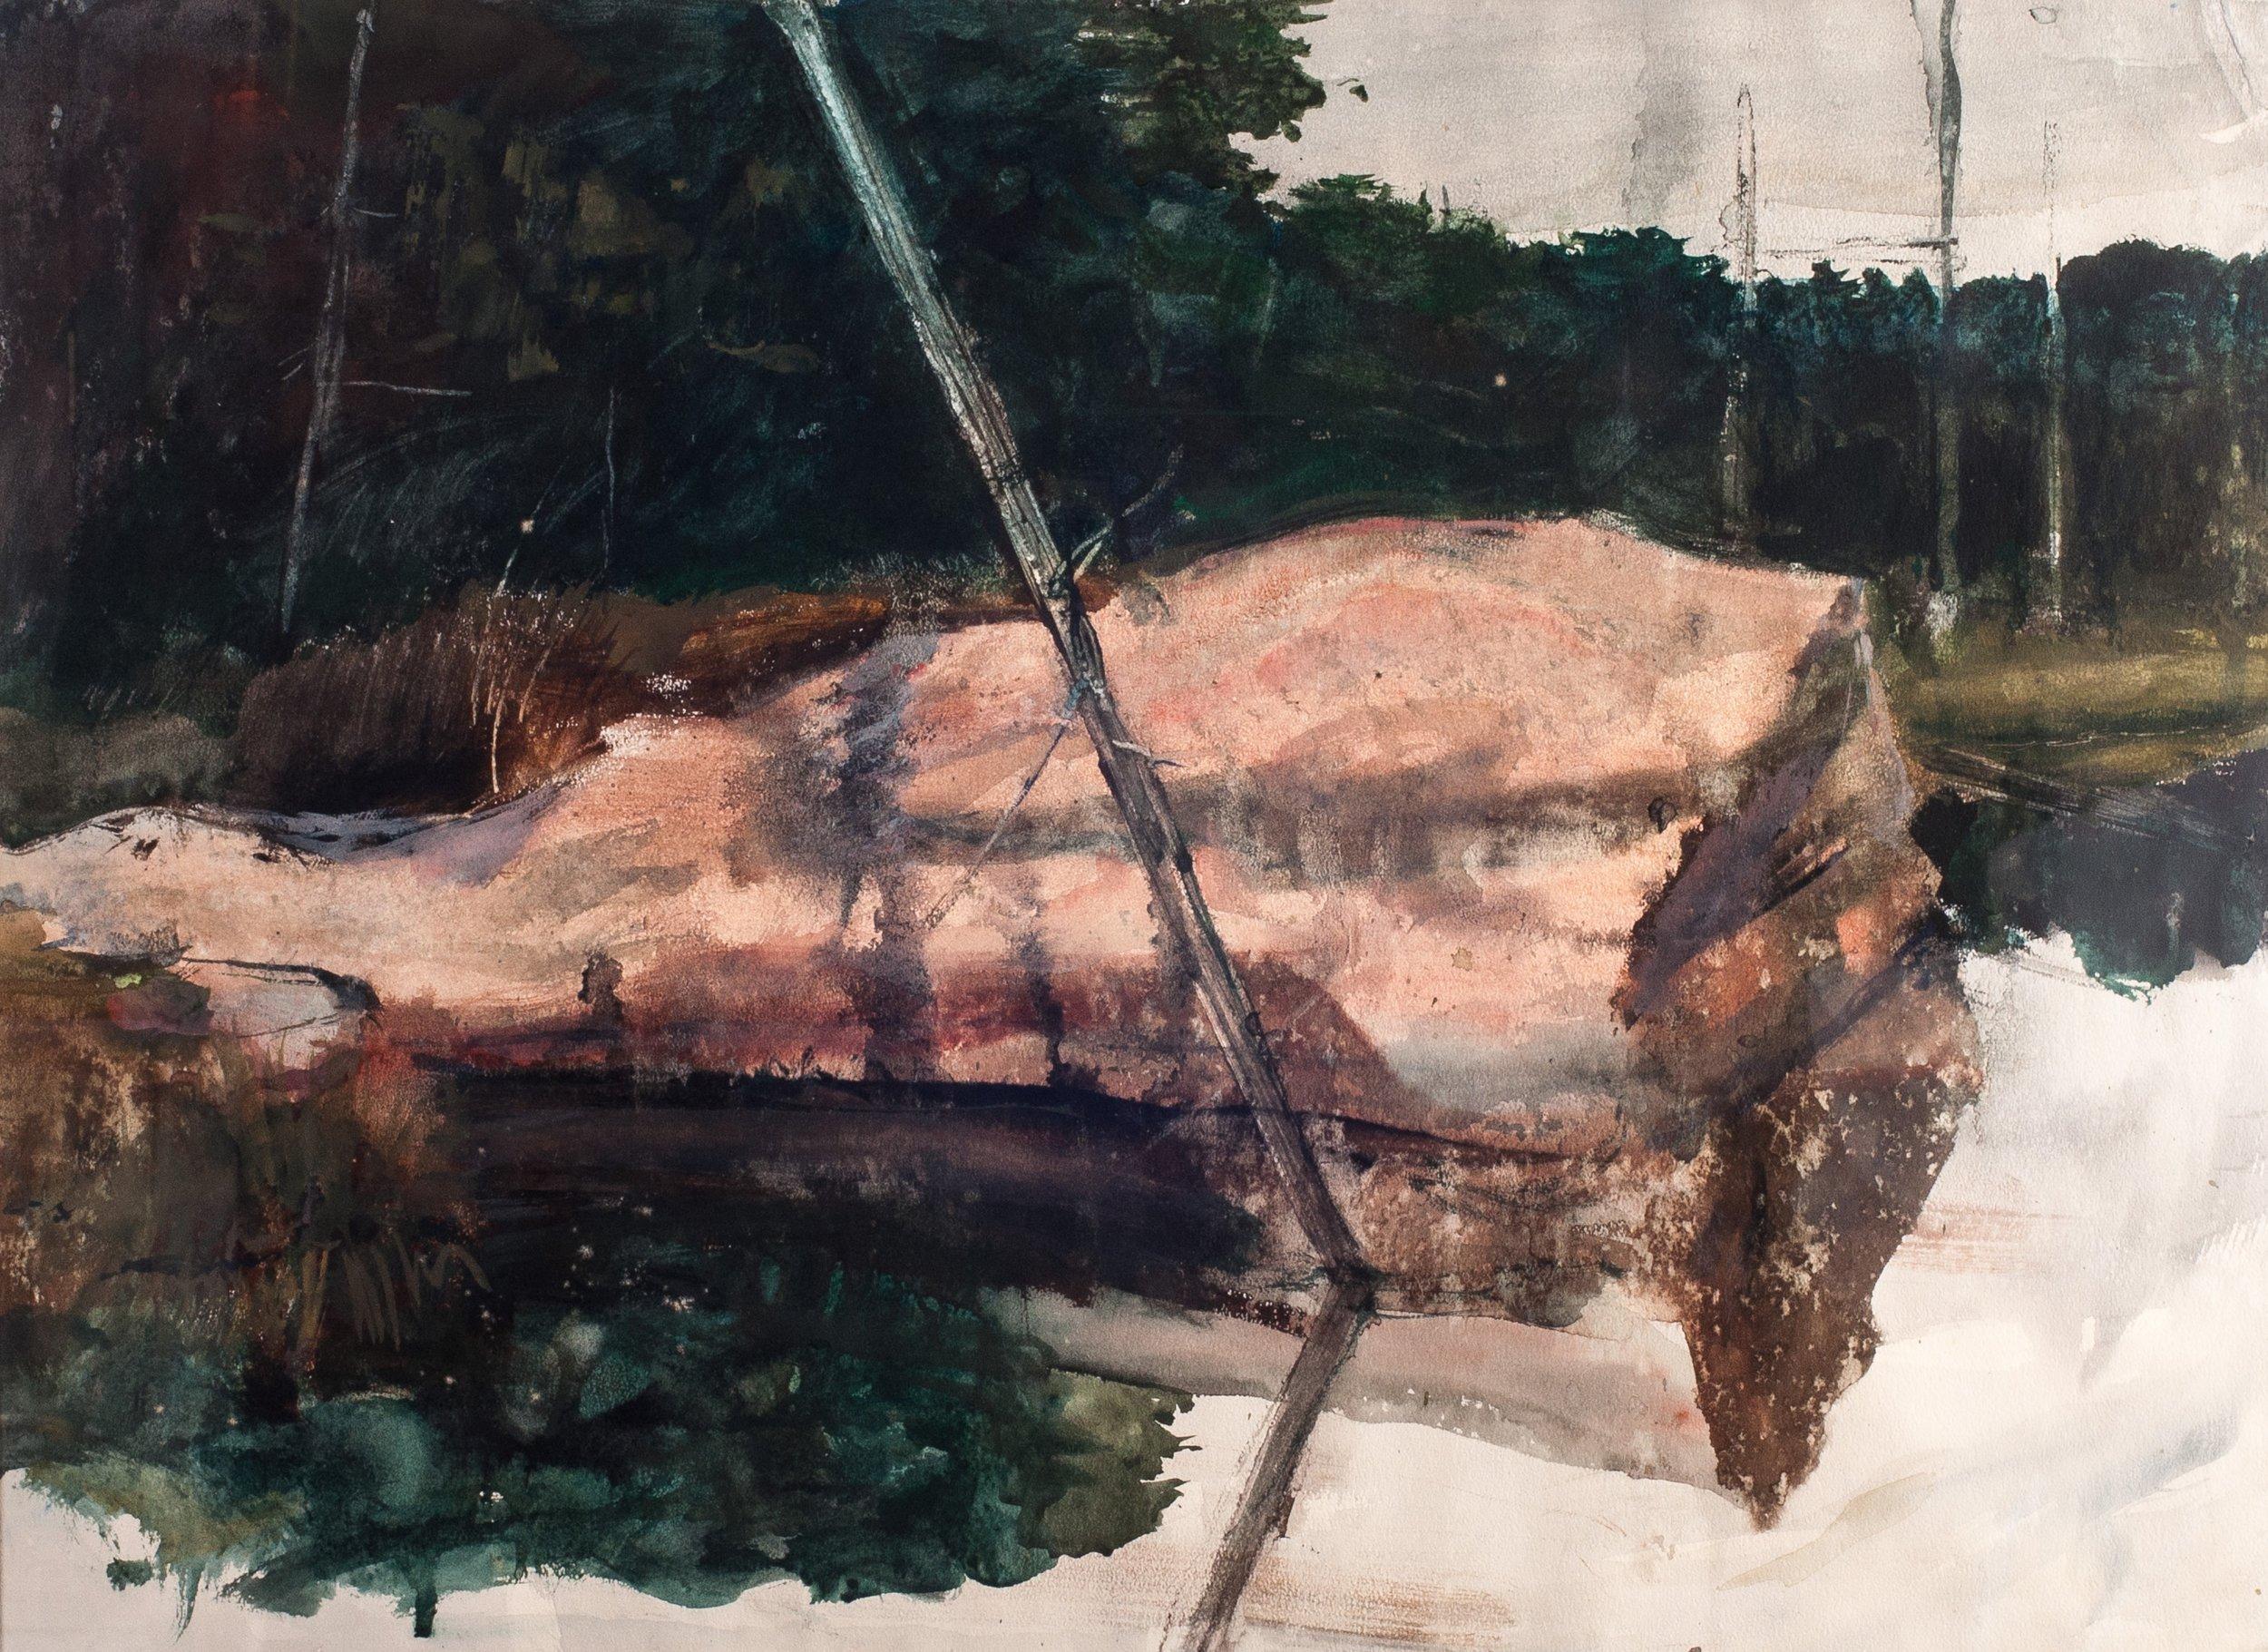 Pink Granite.     1968, watercolor. 20.8 x 28.1 inches.